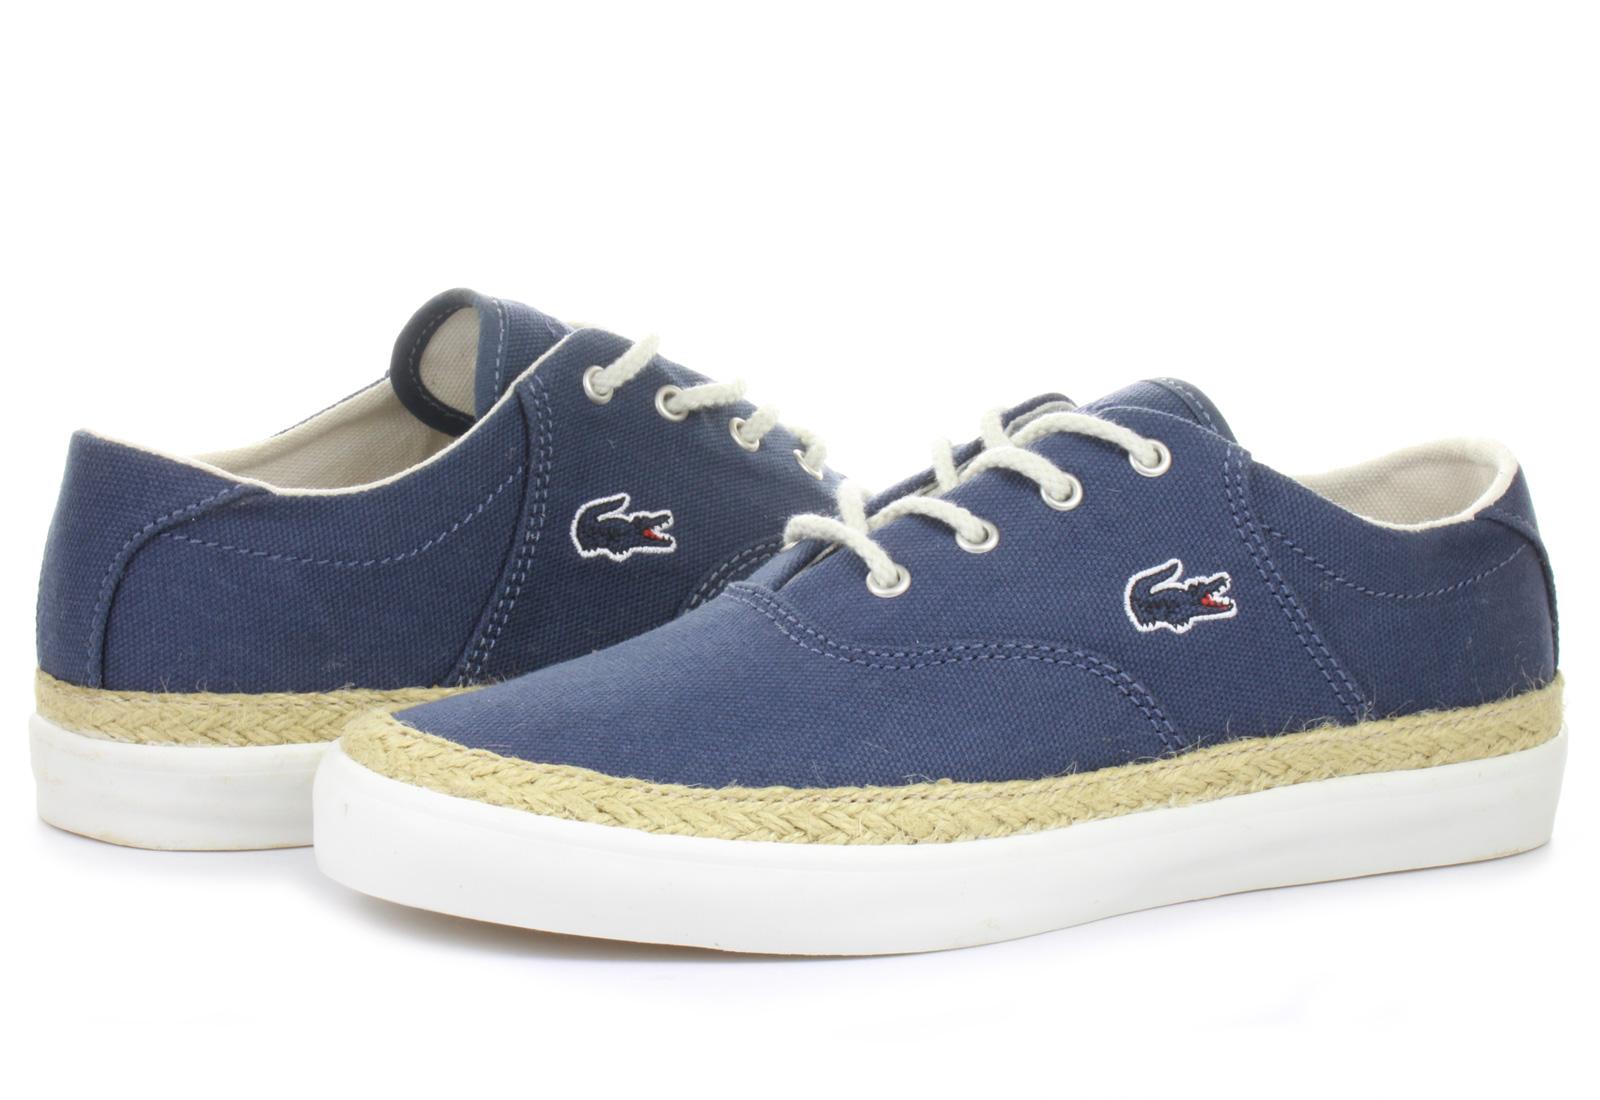 Lacoste Glendon Dark Blue Top Quality shoes online hot sale